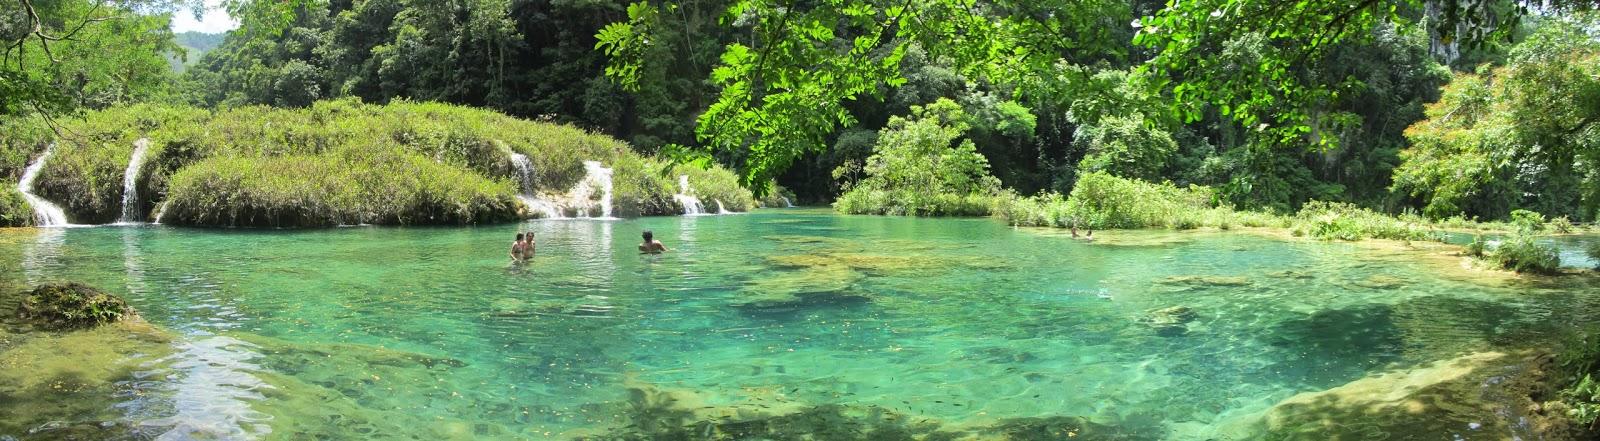 Semuc Champey lagoons in Guatemala